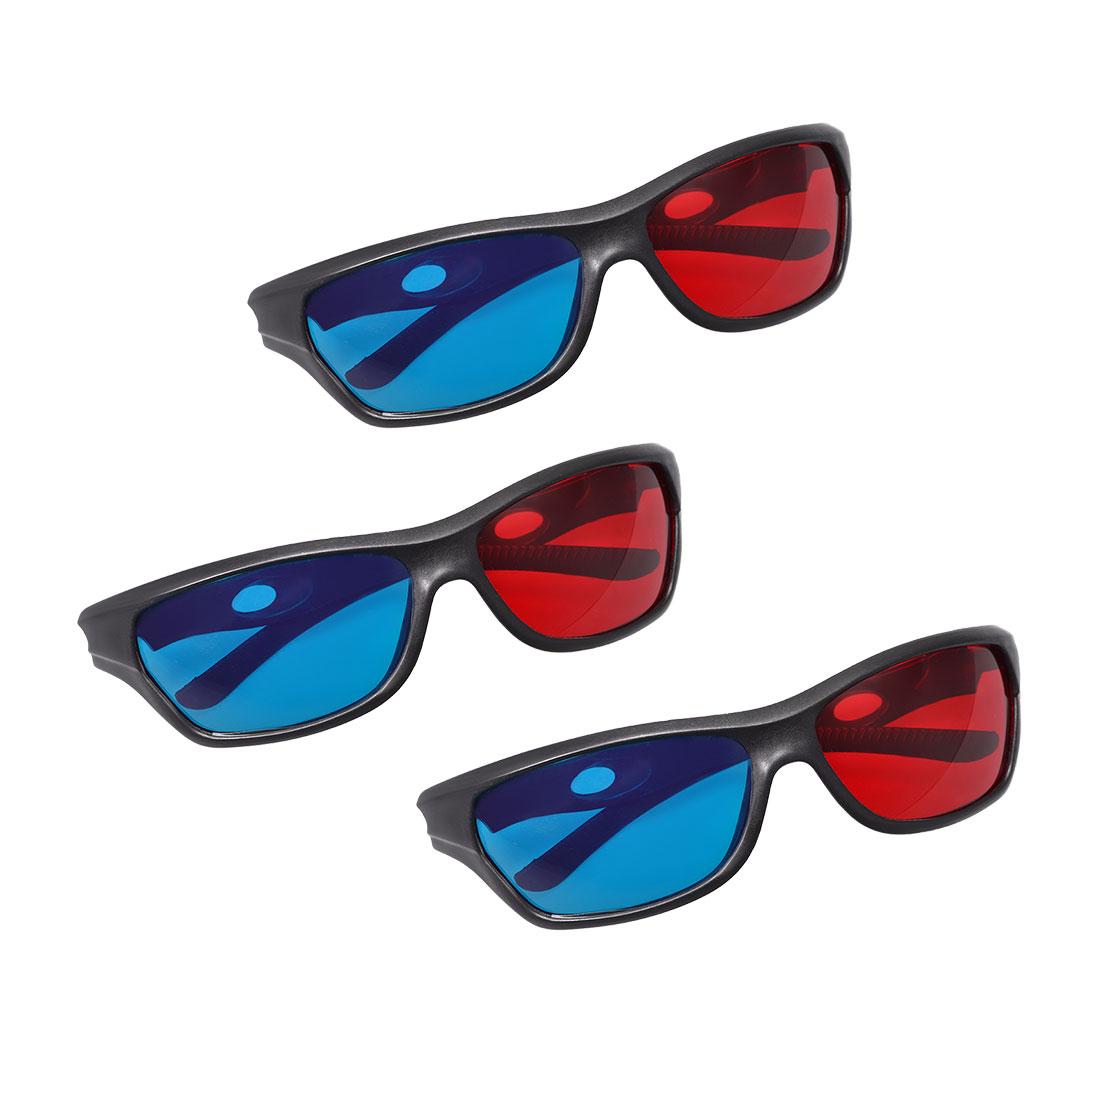 Red-Blue 3D Glasses 3D Visoin Glass for Movies 3D Print Magazines 3pcs